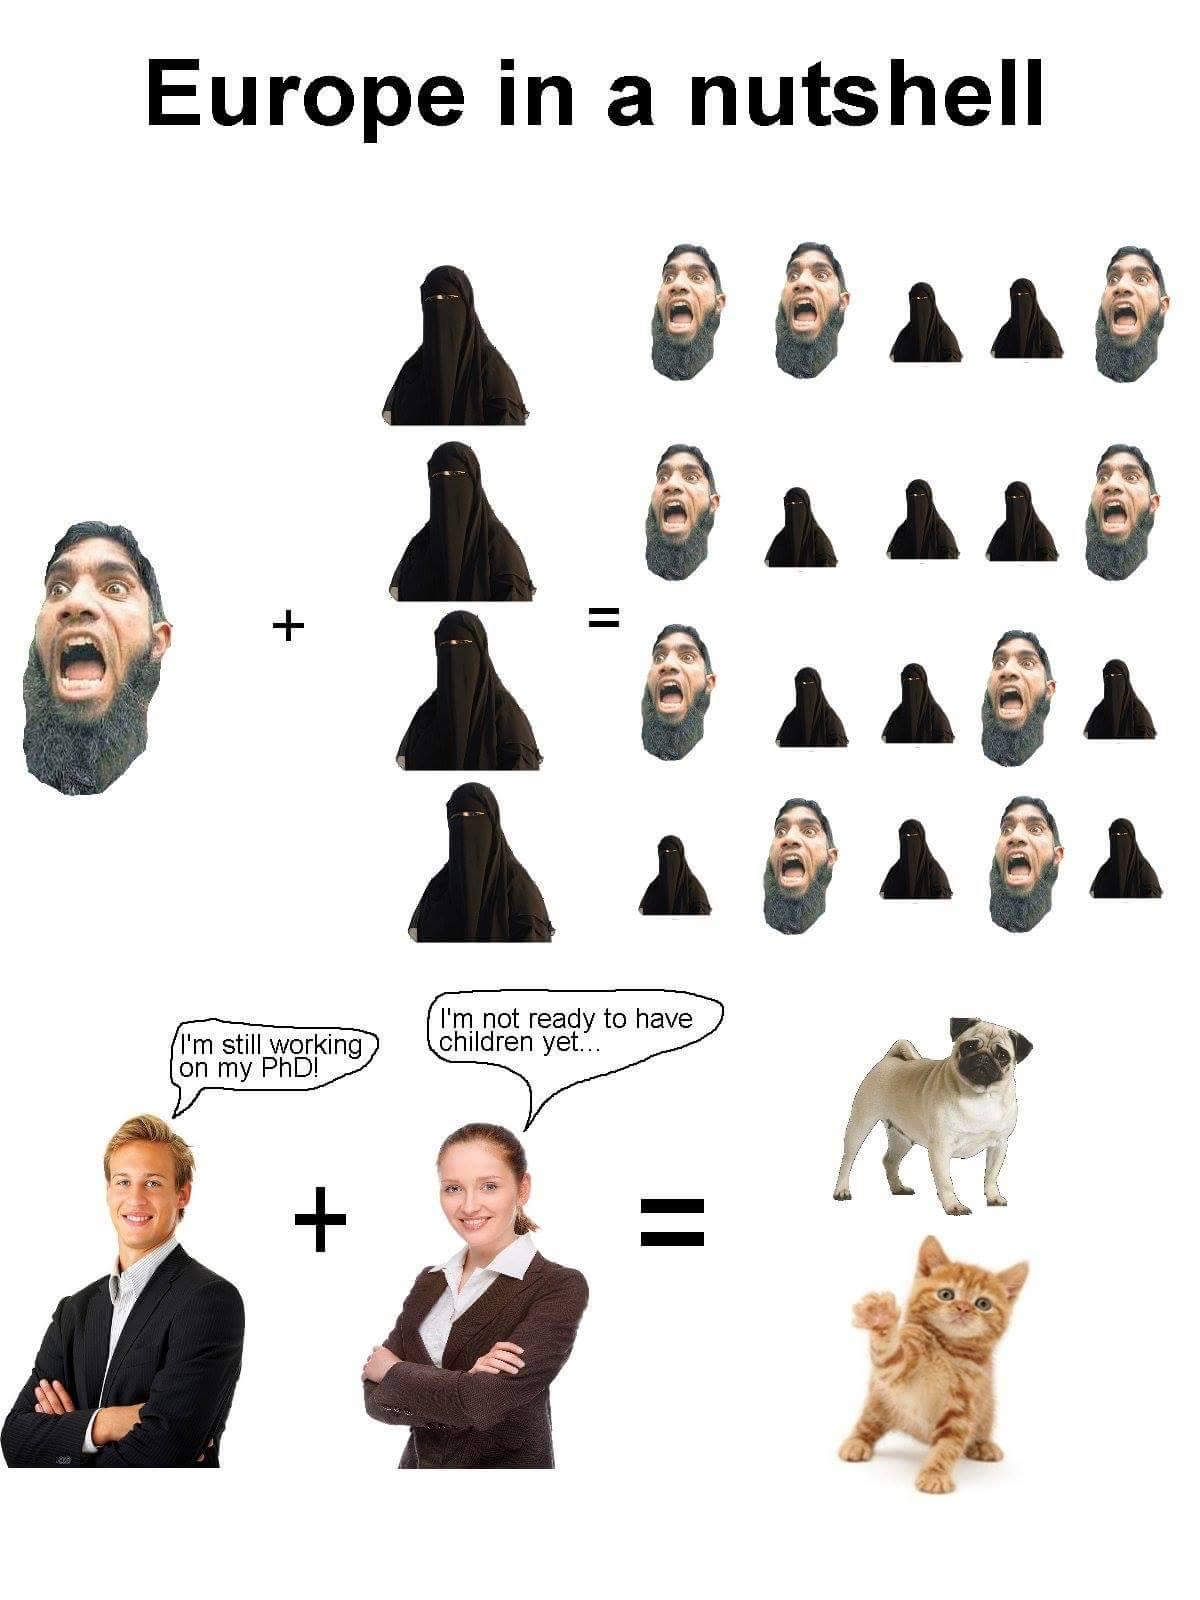 13732004_1145093678883525_8968807461092702749_o-europa-how-islam-spreads-in-a-nutshell